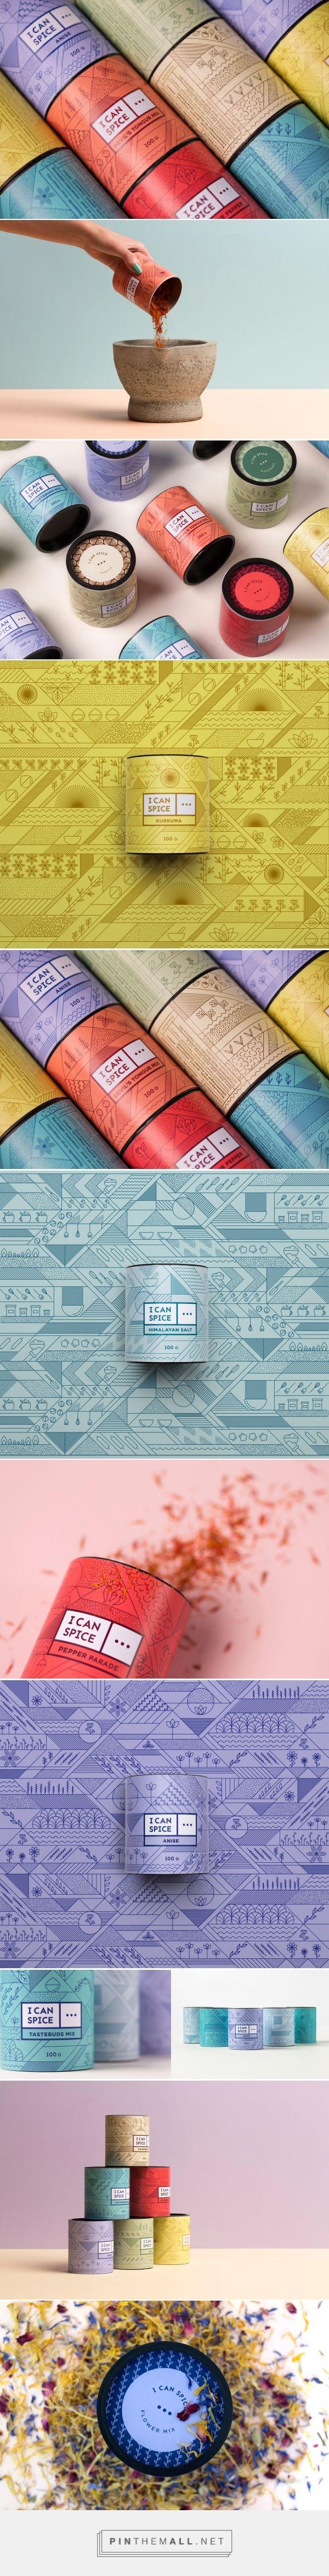 I Can Spice packaging design by DekoRatio Branding & Design Studio - http://www.packagingoftheworld.com/2017/09/i-can-spice.html